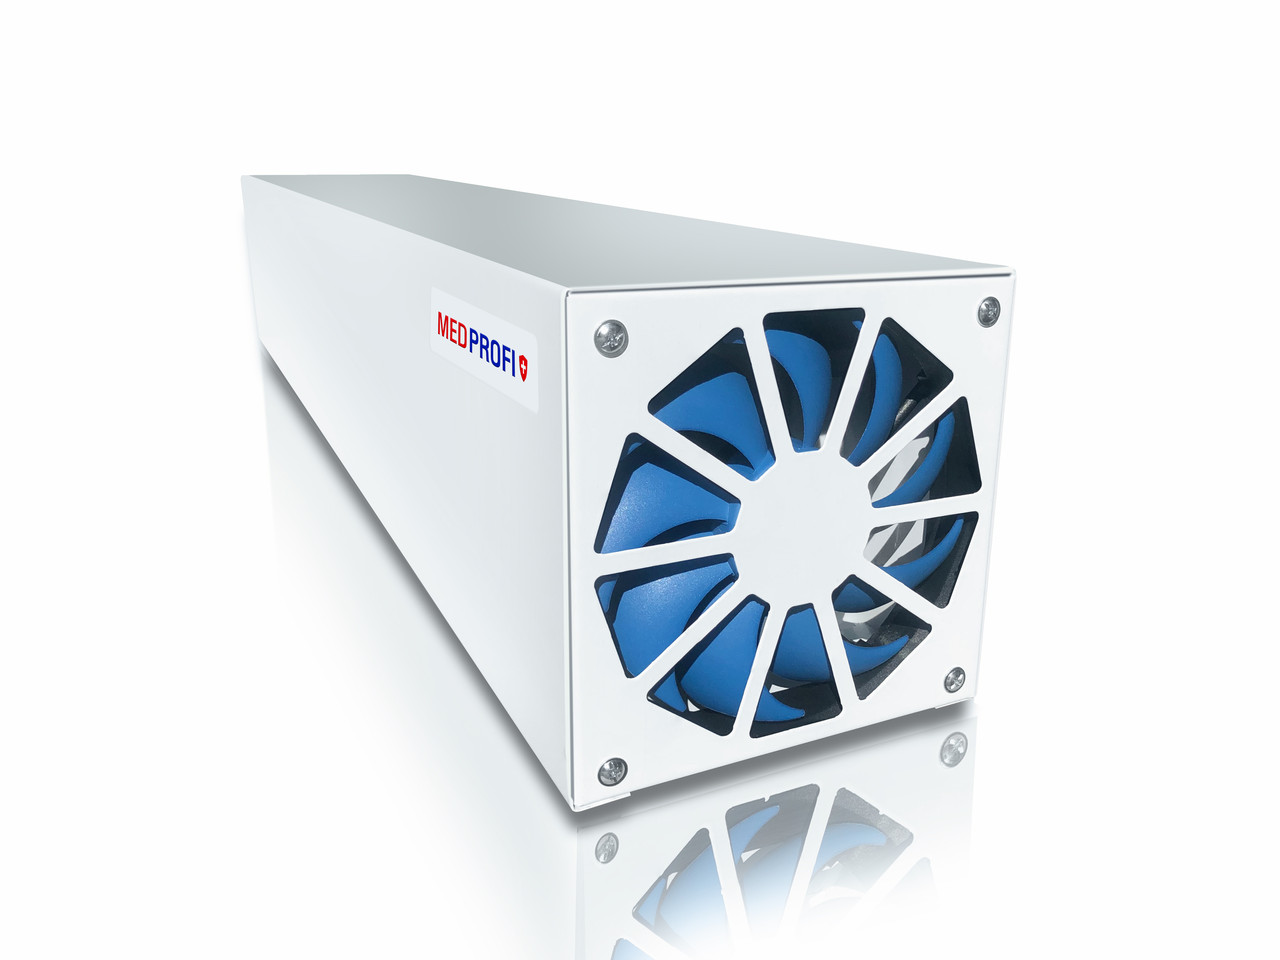 Бактерицидный рециркулятор воздуха MEDPROFI 30 Вт